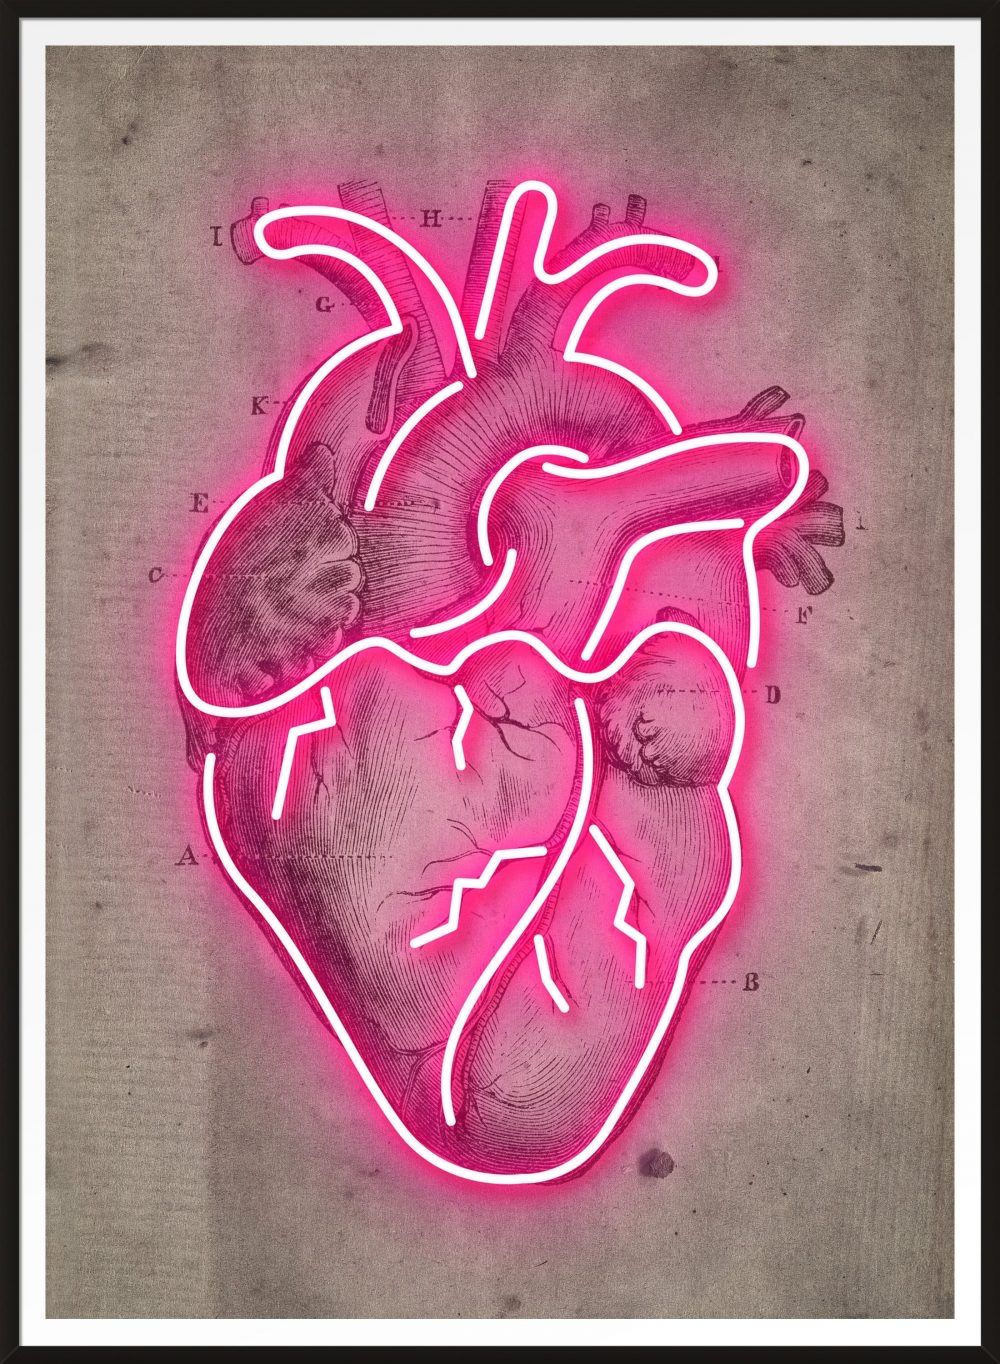 Pin by 𝕬𝖓𝖓𝖒𝖆𝖗𝖎𝖊 on λπλτσϻιςλl нελгτs Heart diagram, Neon